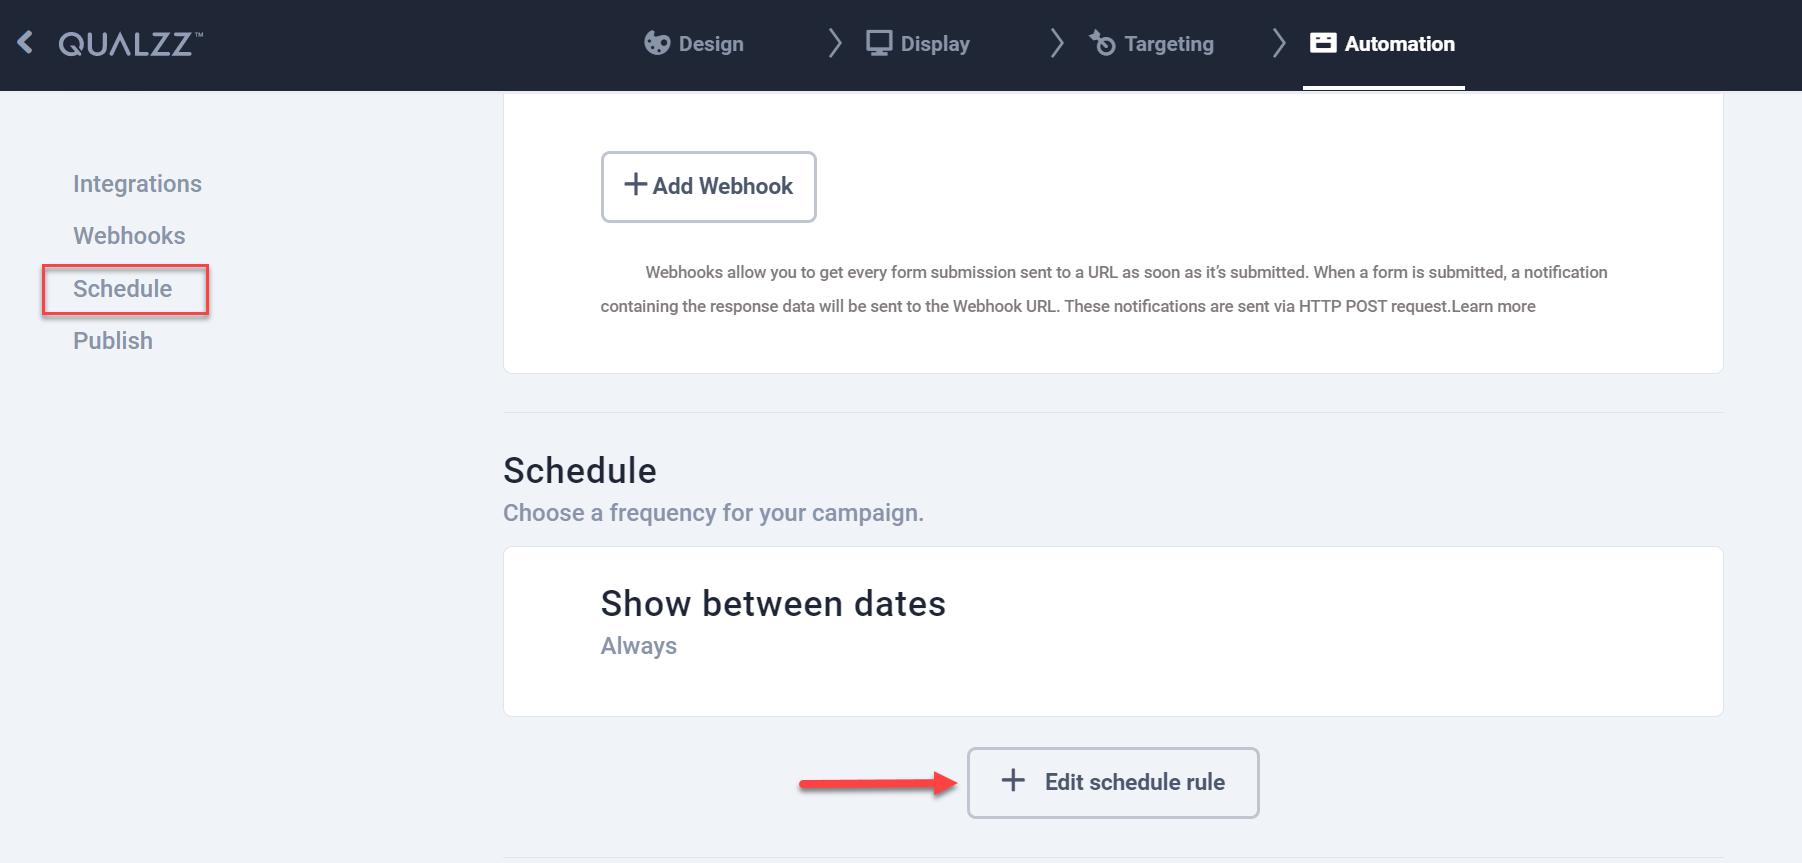 Schedule rule